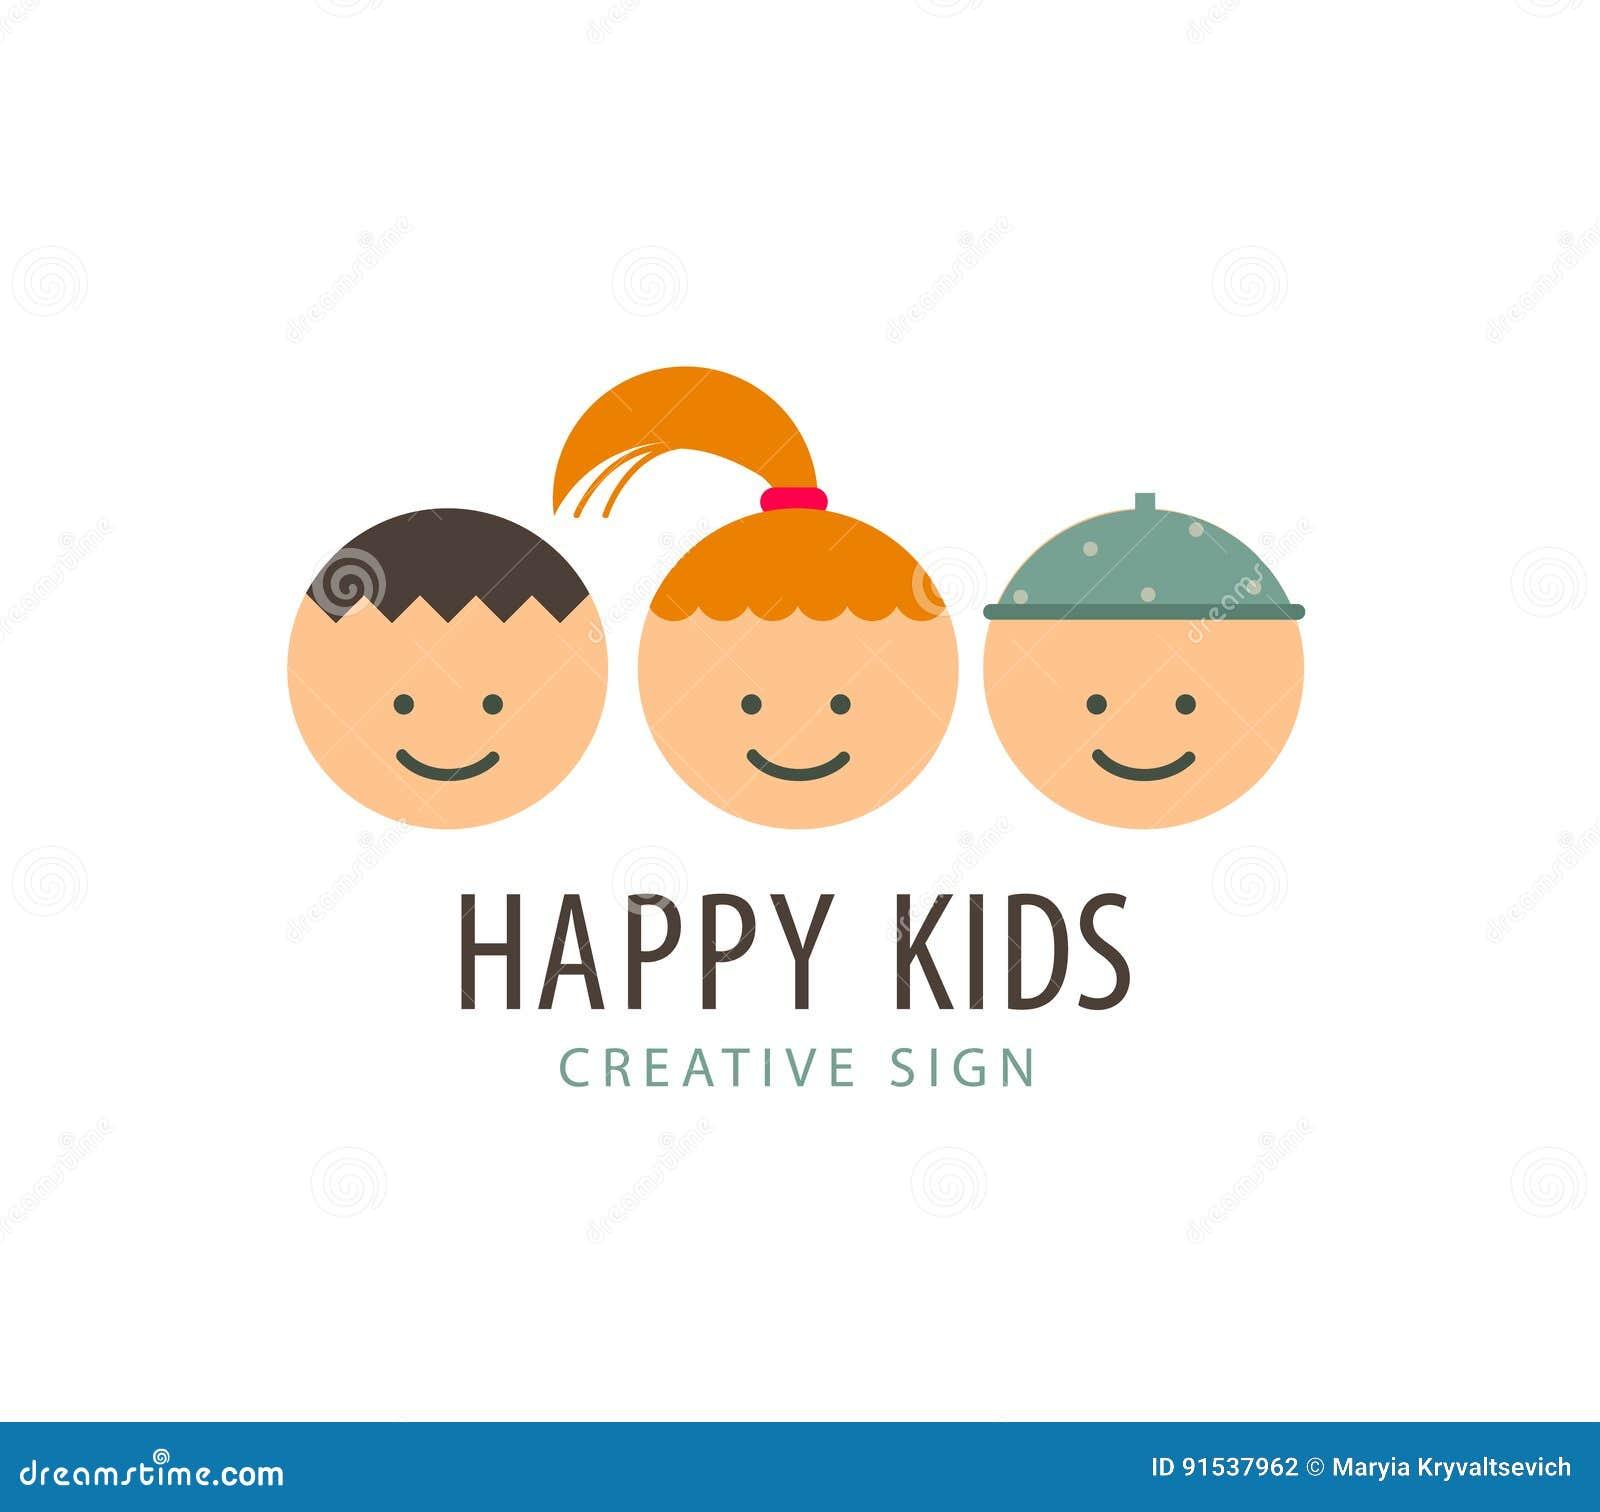 Funny Cartoon Images Of Boys vector 3 kids faces, funny cartoon, boys and girl logo stock